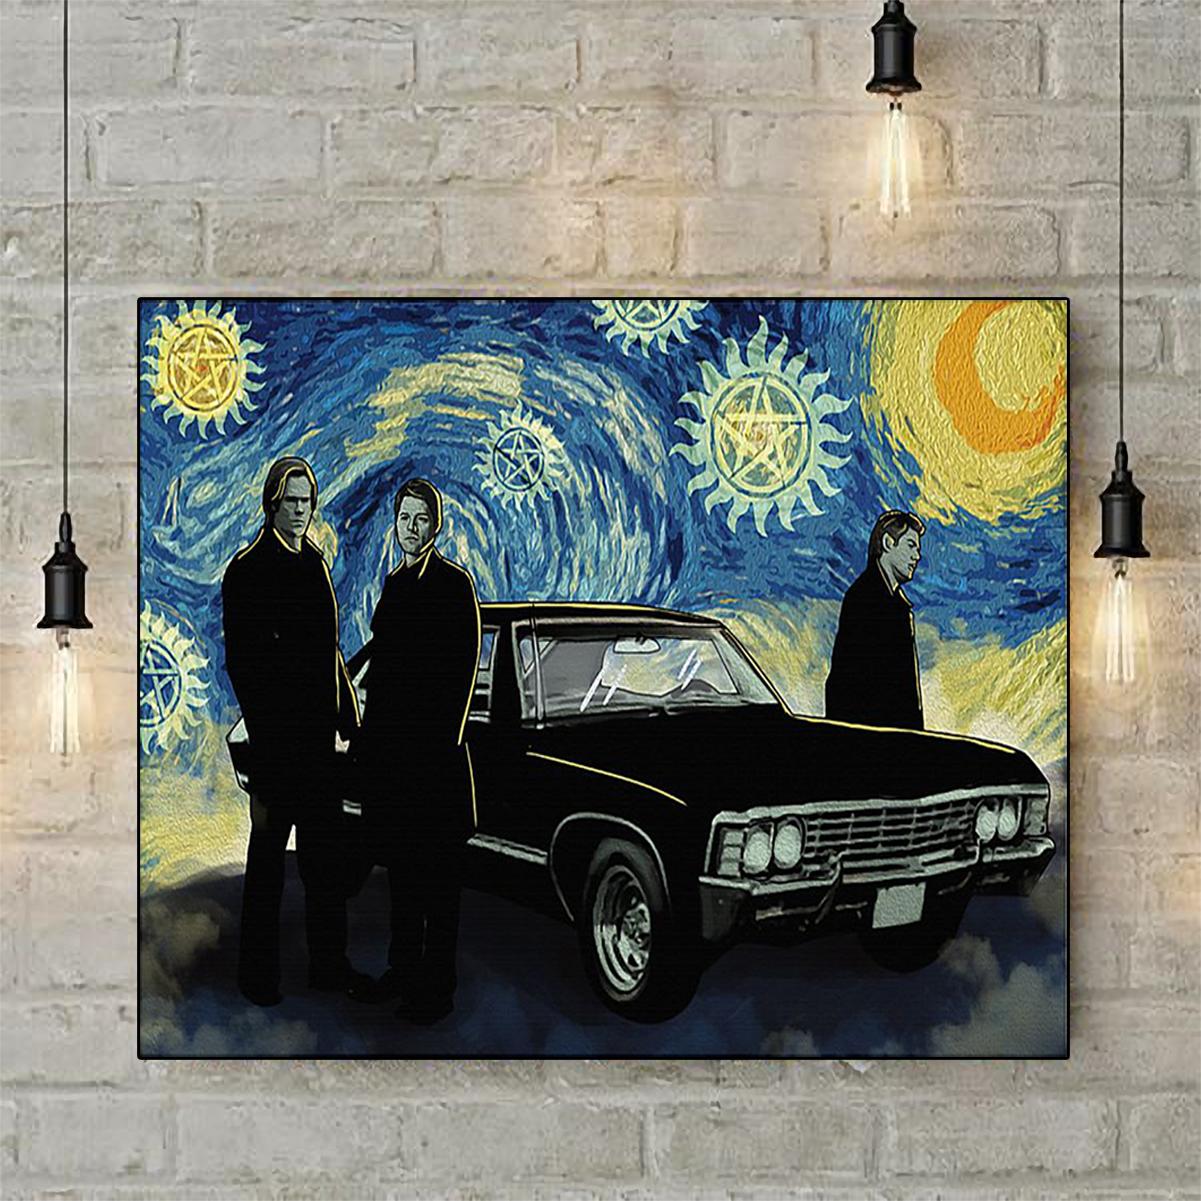 Supernatural starry night van gogh poster A2